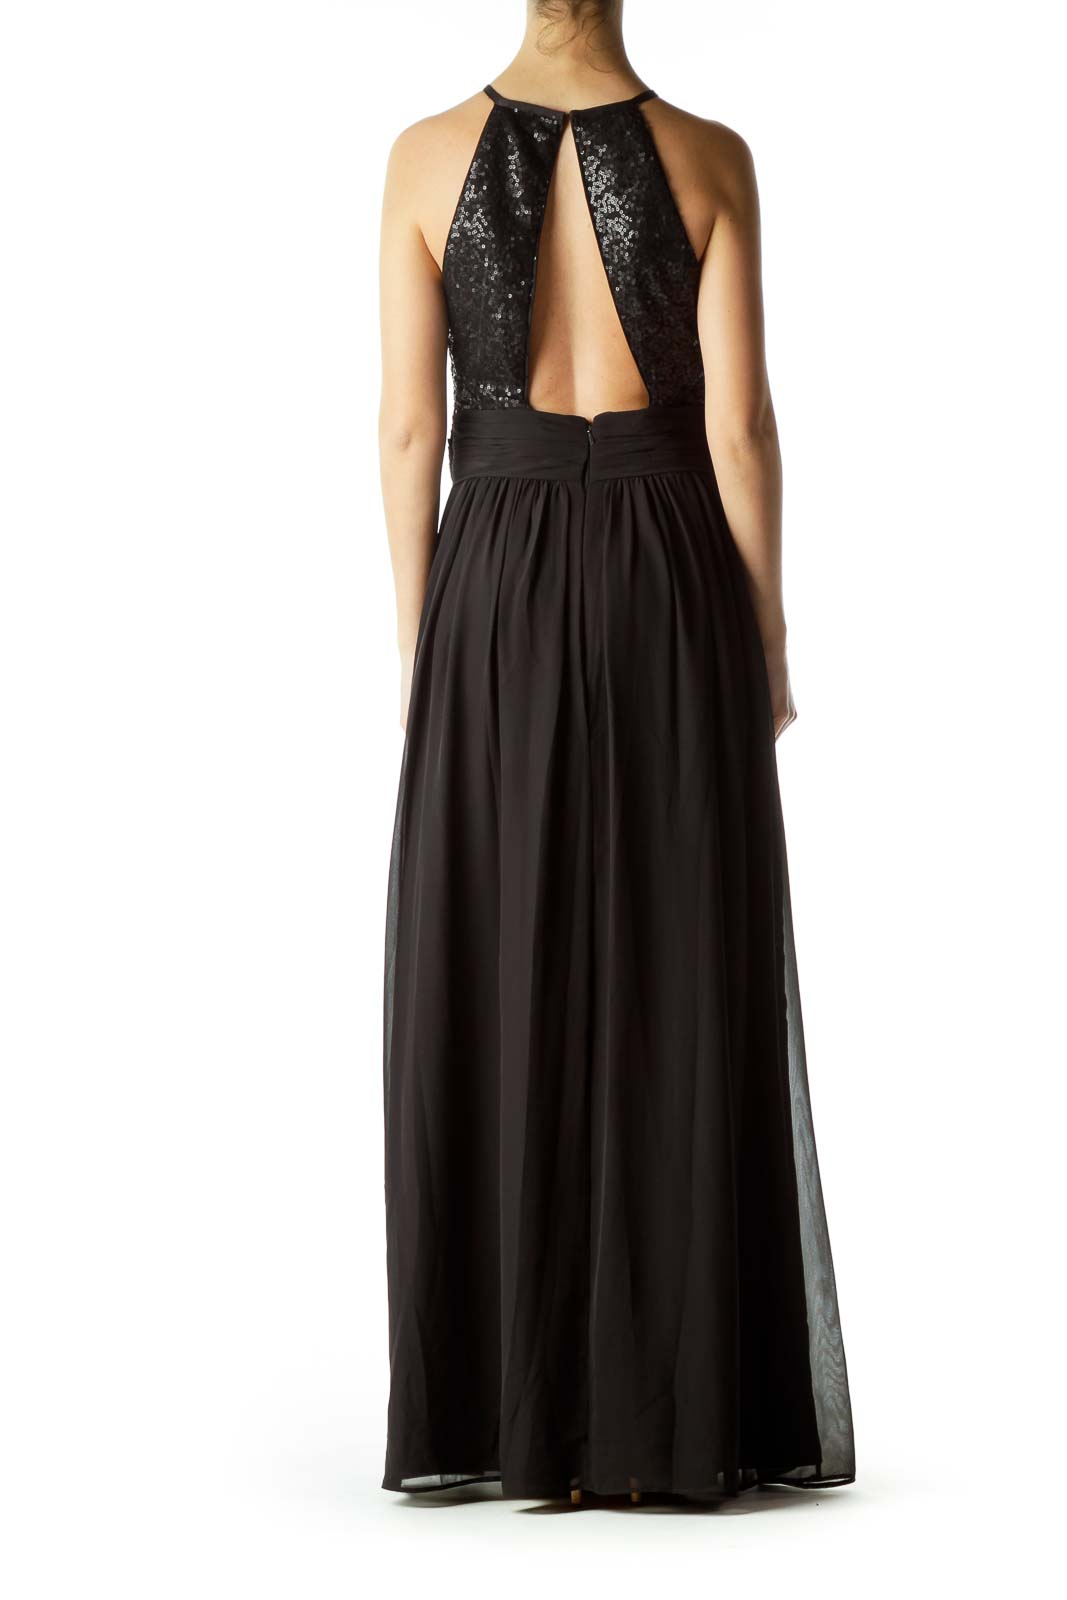 Black Sequin Detailed Evening Dress